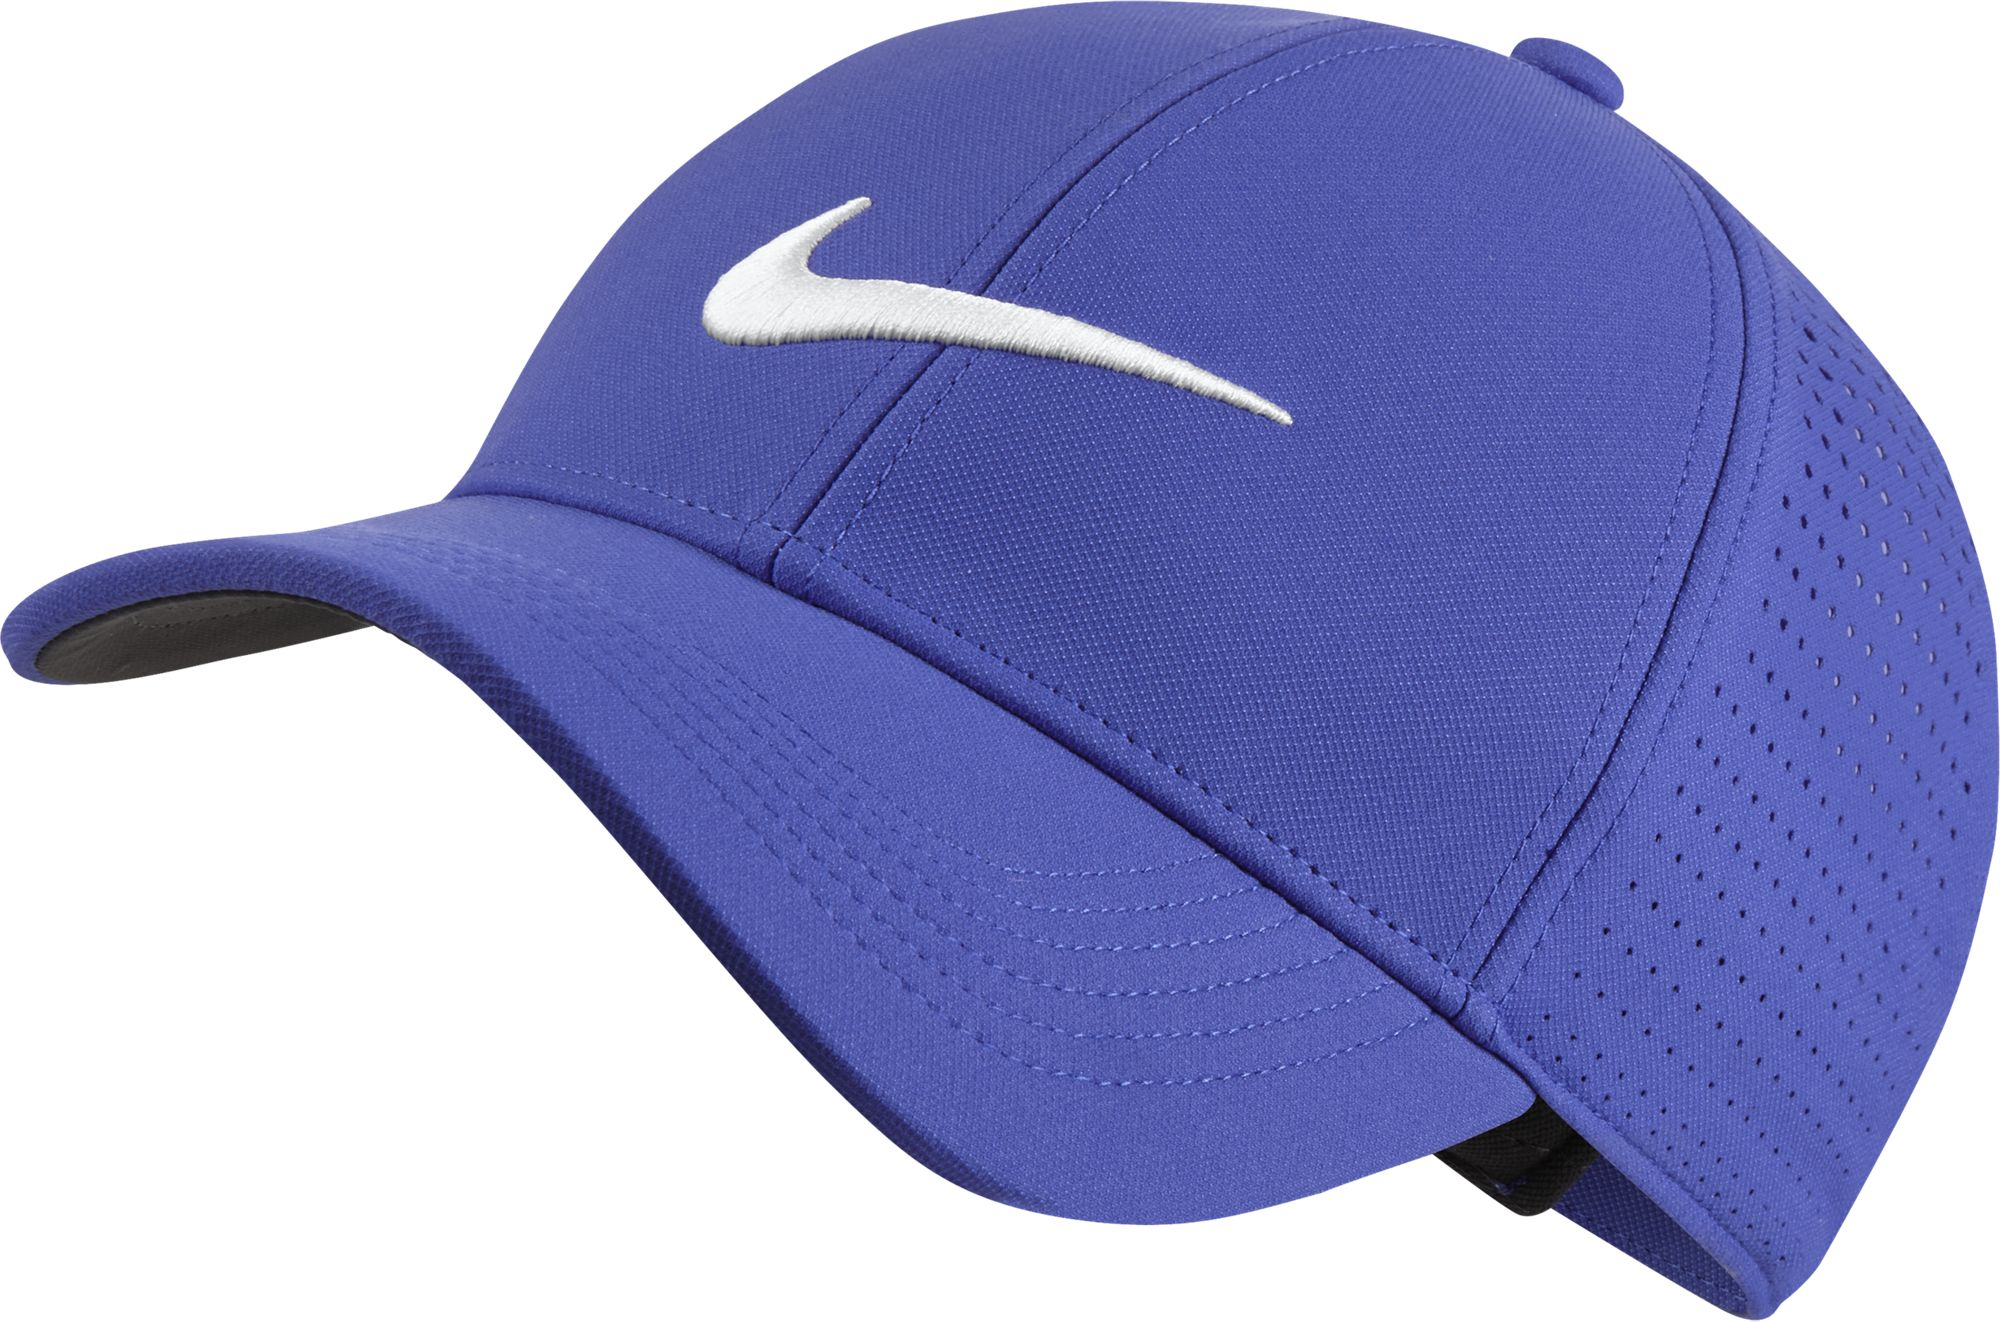 a438e189b21b5 ... Nike-Golf-2017-Legacy-91-Perforated-Adjustable-Cap- ...